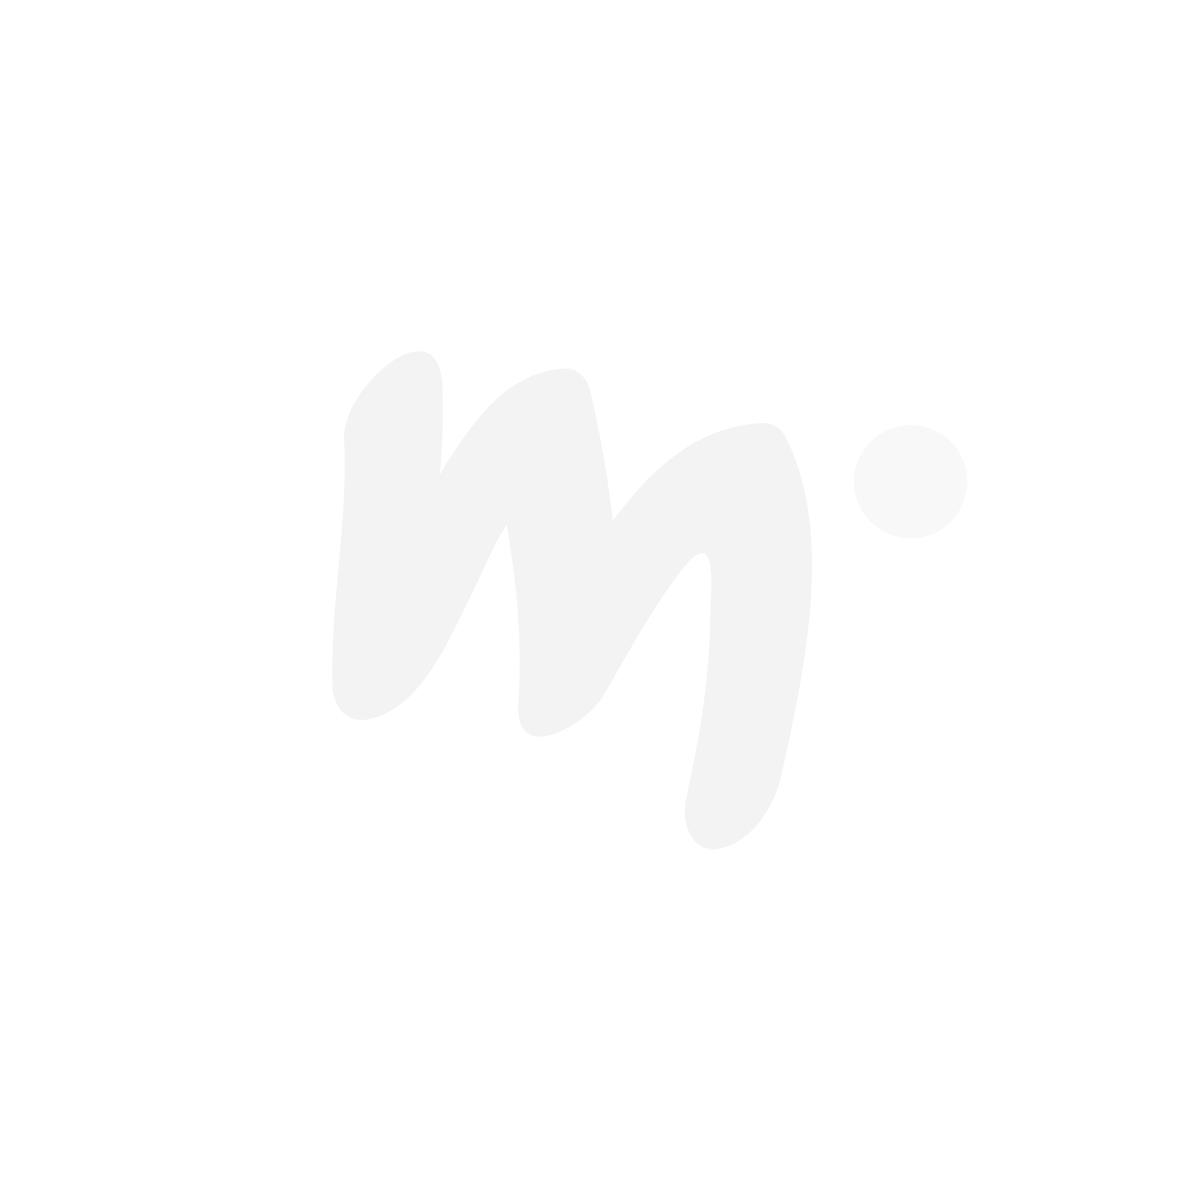 Peppi Pitkätossu Peppi leipoo -kulho valkoinen M